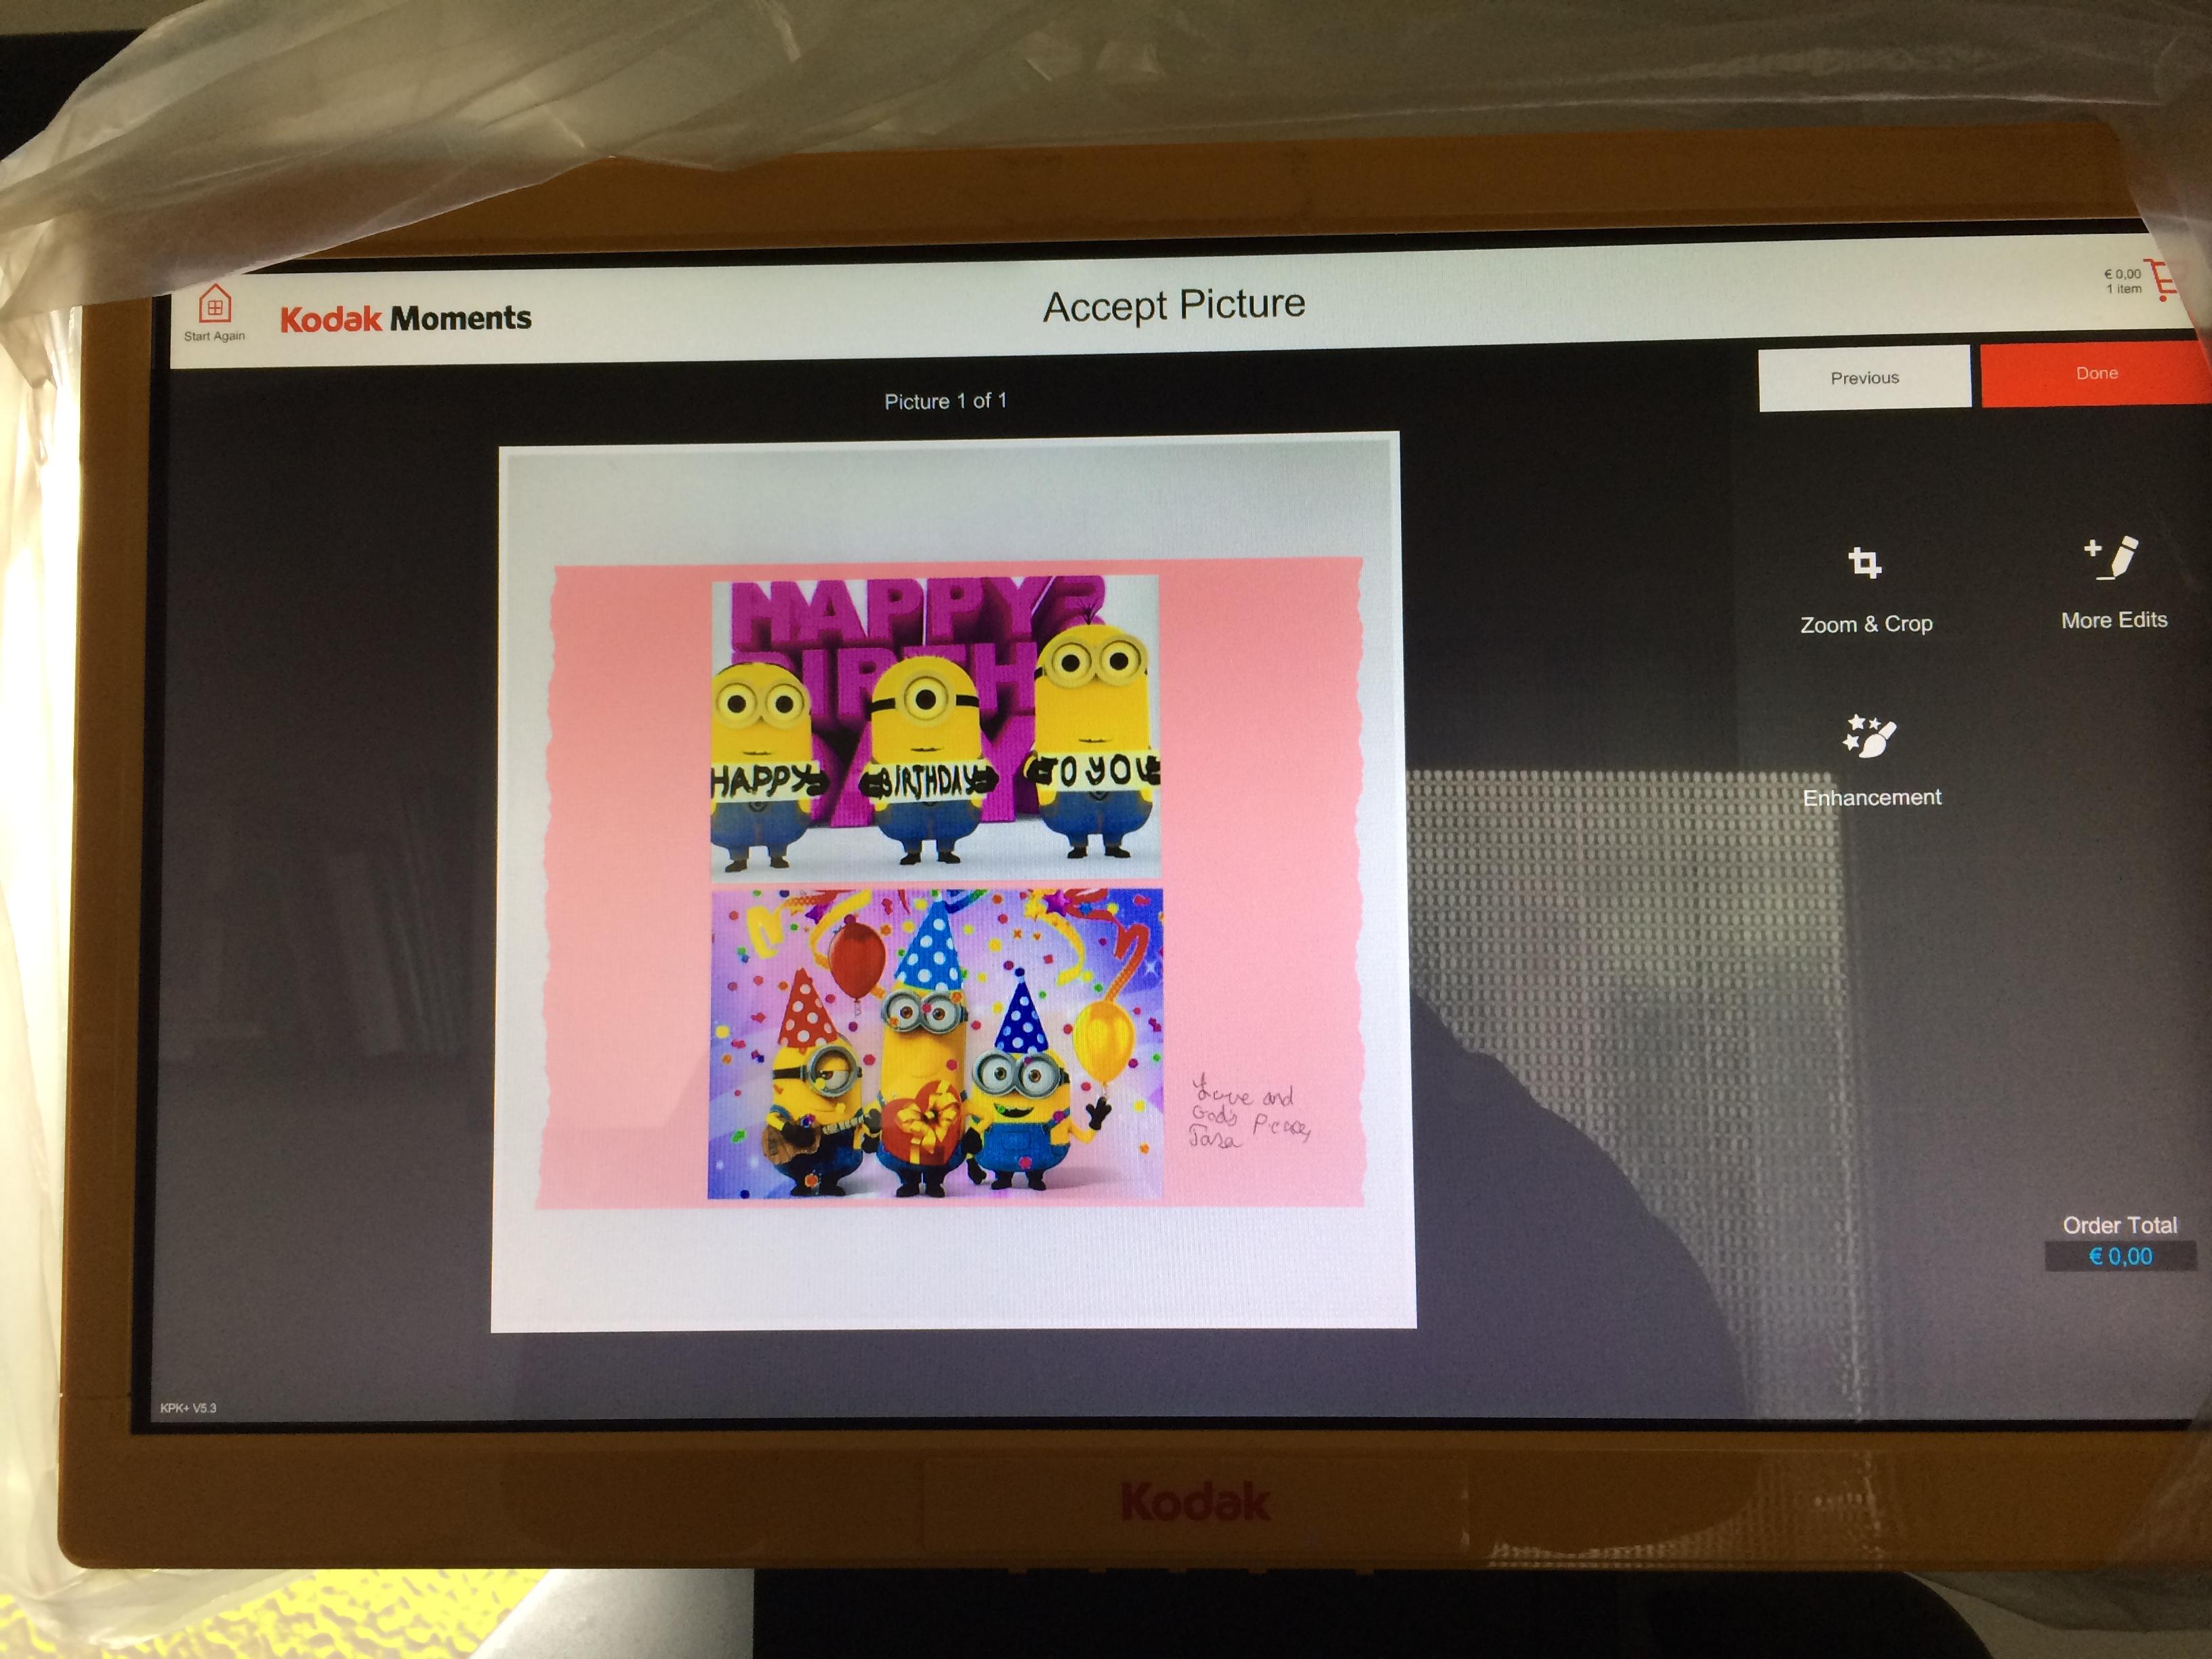 Problems with Kodak Picture Kiosk - Affinity on Desktop